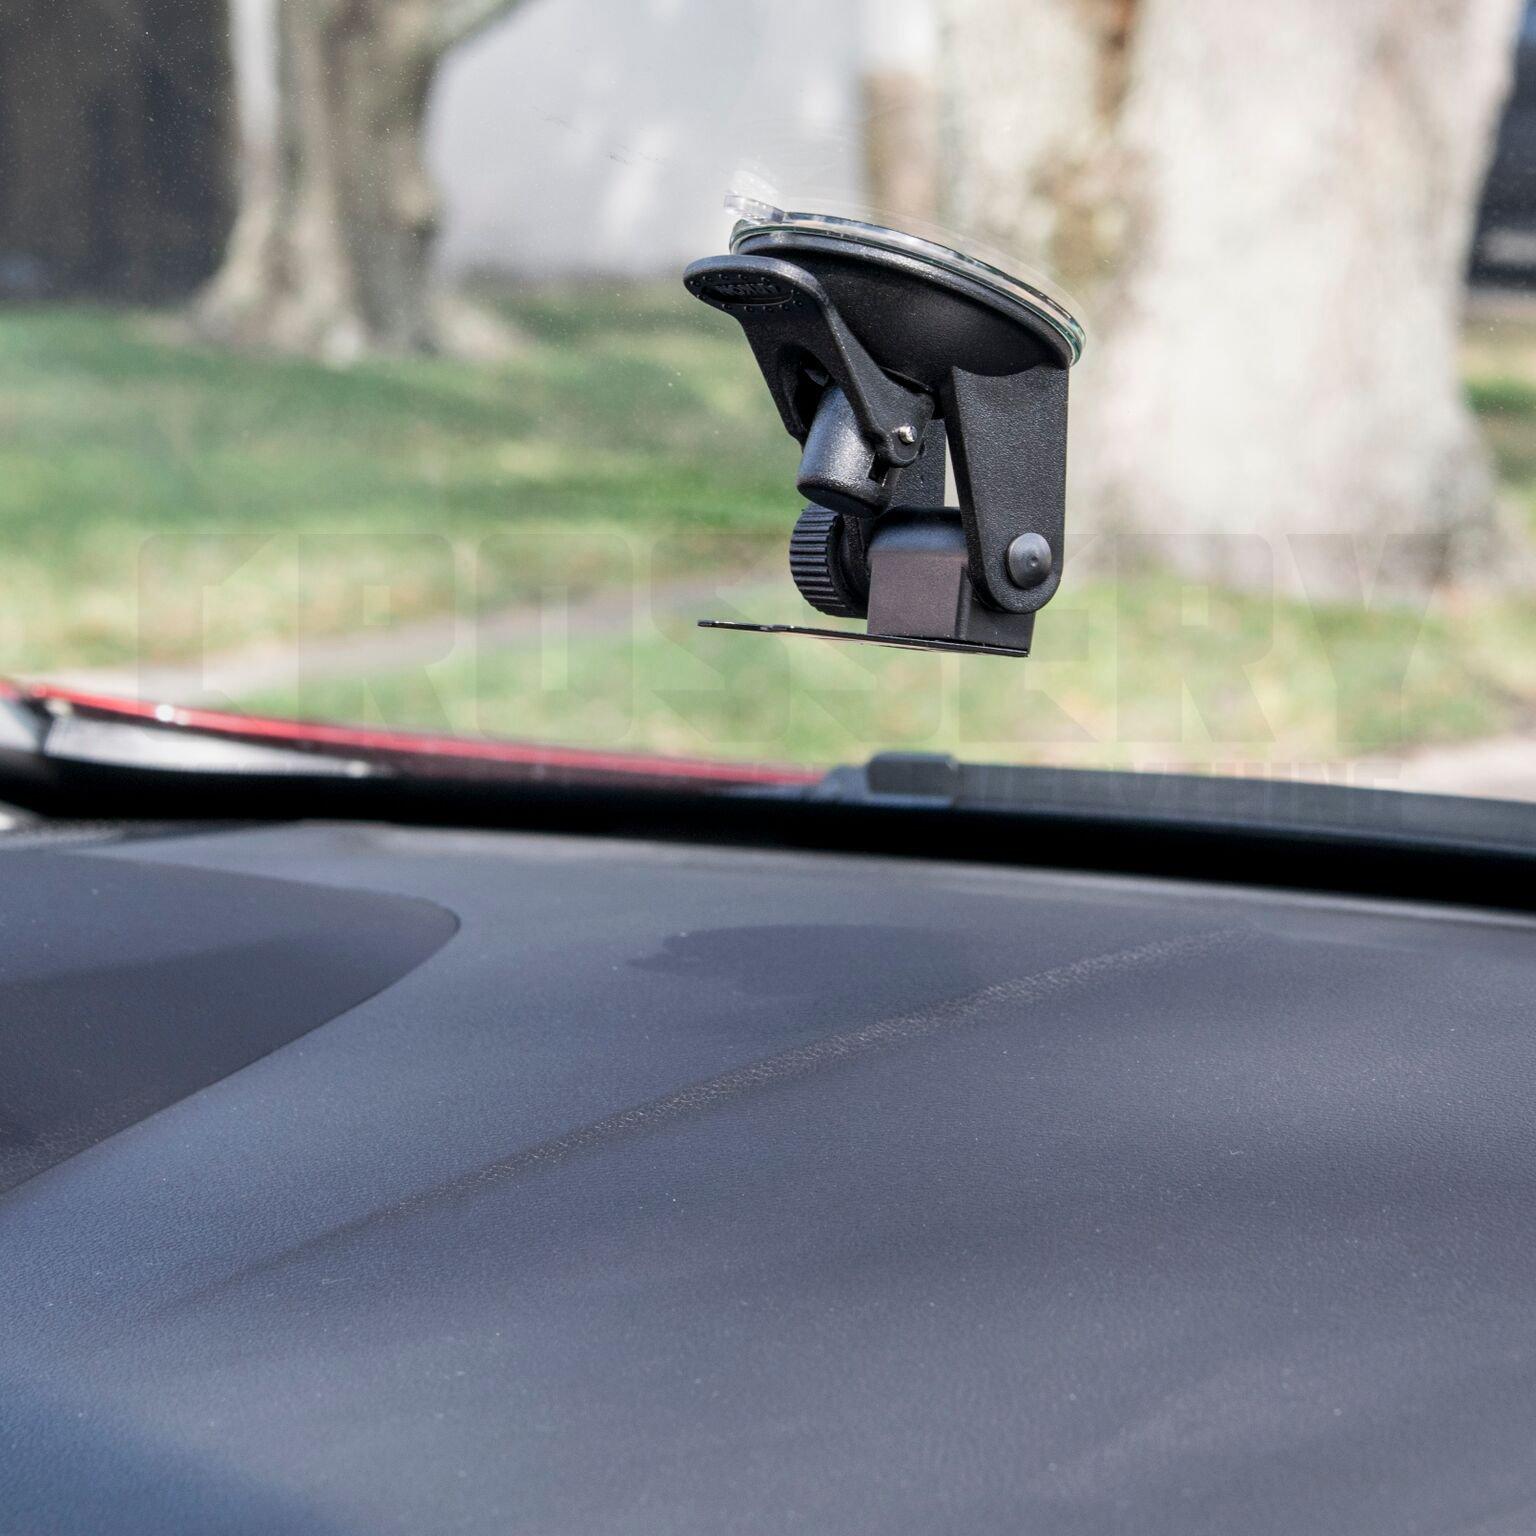 Car Radar Mount, Crossery Windshield & Dashboard Radar Detector Suction Mount for Escort Passport, Beltronics Vector & Rocky Mountain Phantom-T Radar Detectors, Easy To Install, Adjustable, Black by Crossery (Image #2)